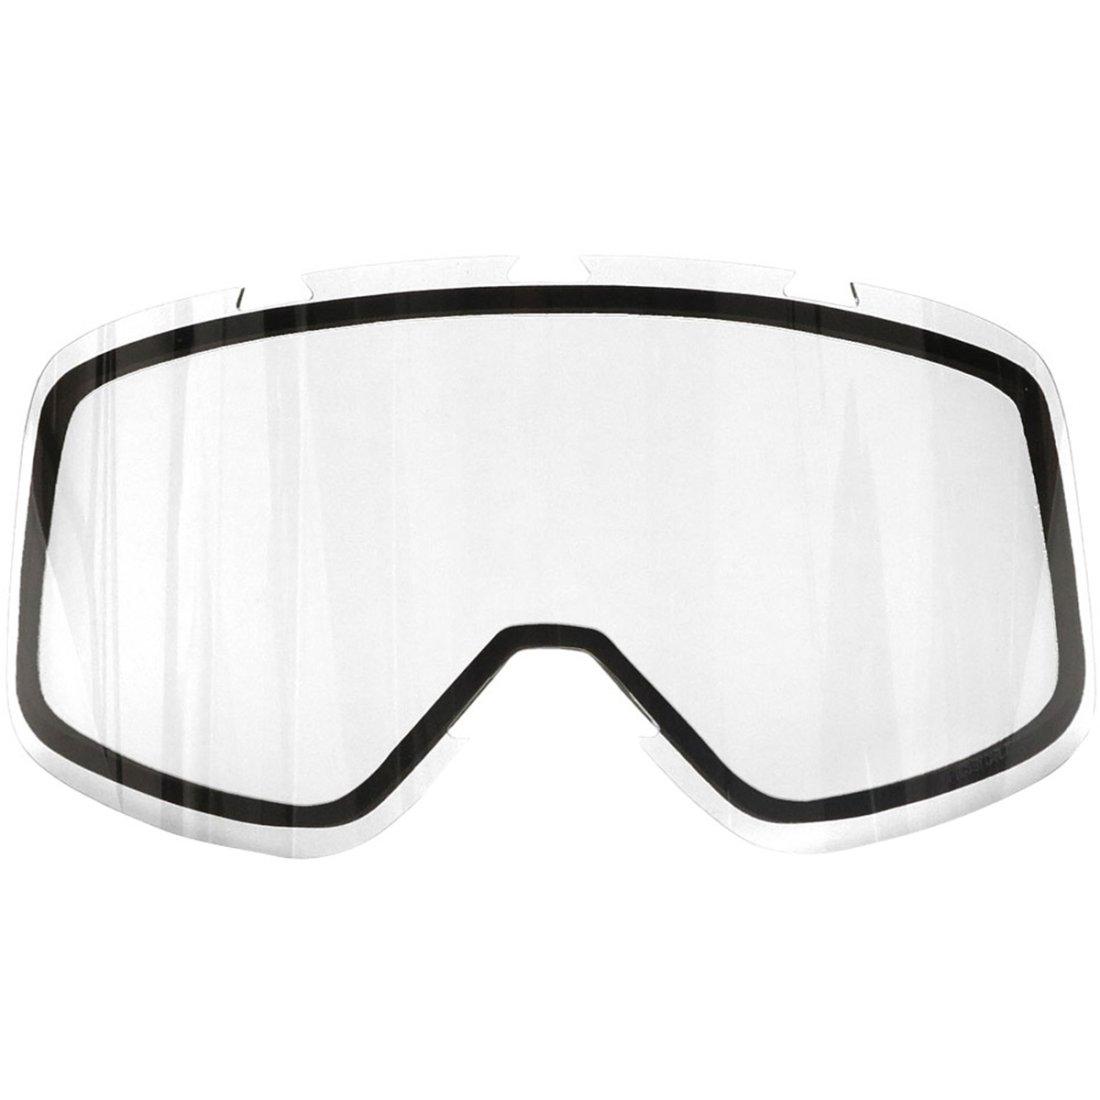 SHARK Raw   Vancore   Explore-R Lens Clear Helmet accessory · Motocard 5638441e4b02